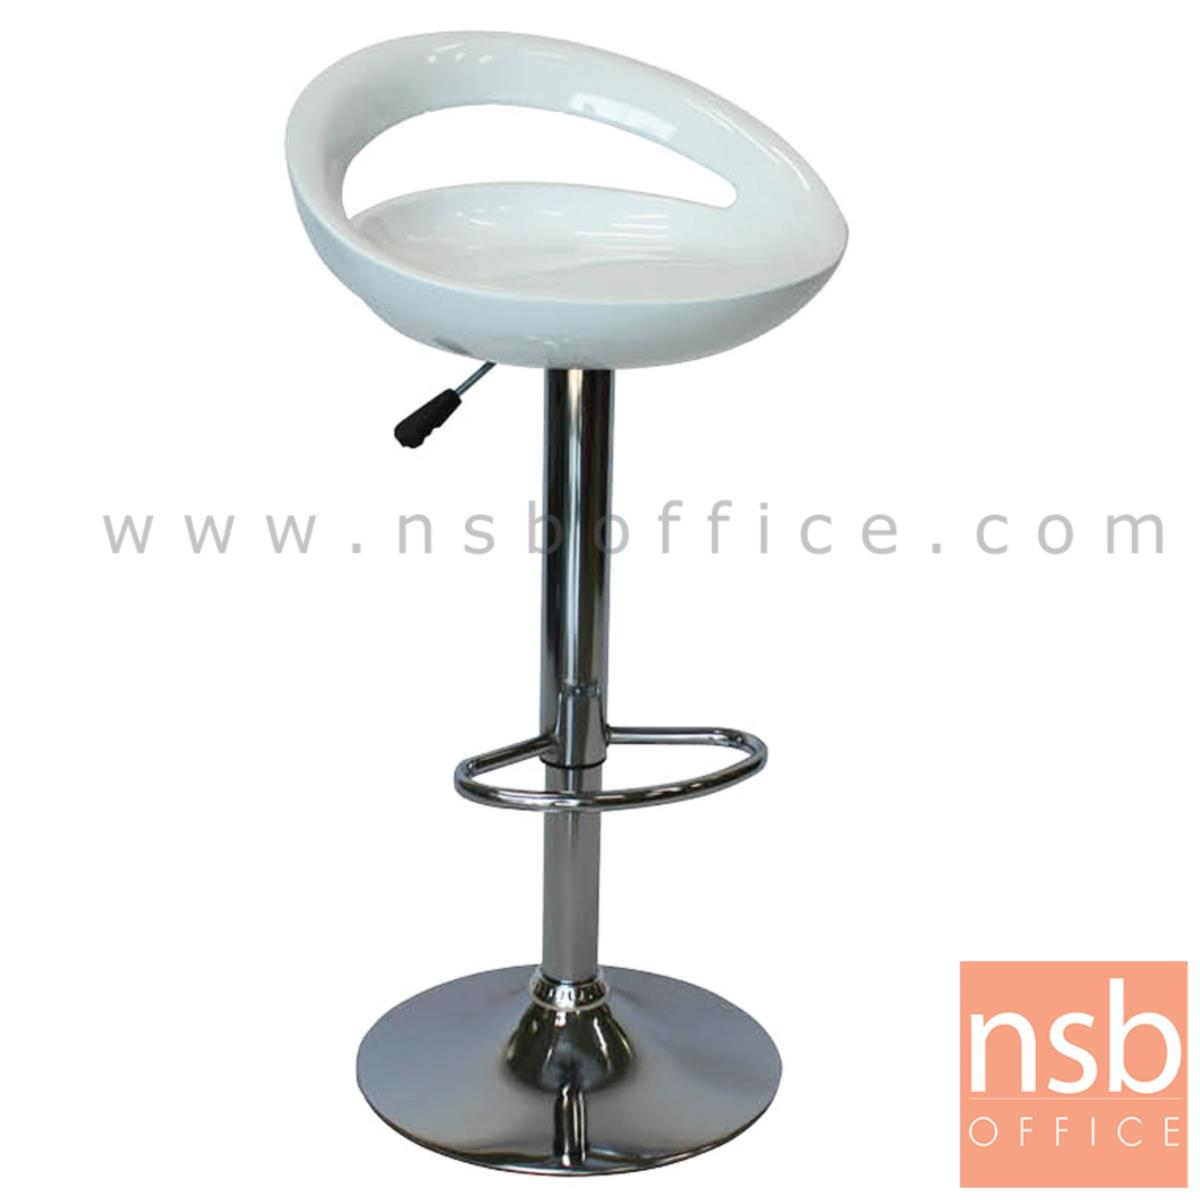 B18A080:เก้าอี้บาร์สูงพลาสติก รุ่น Jupiter (จูปิเตอร์)   ขาโครเมี่ยมฐานจานกลม